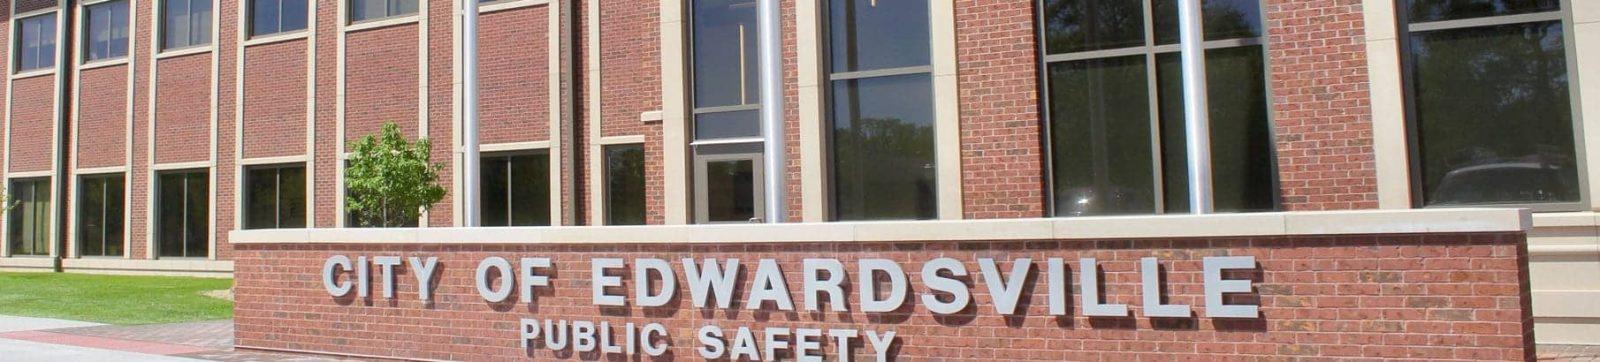 edwardsville assault injury lawyer FAQ; edwardsville assault injury law firm; edwardsville assault injury lawsuit settlements